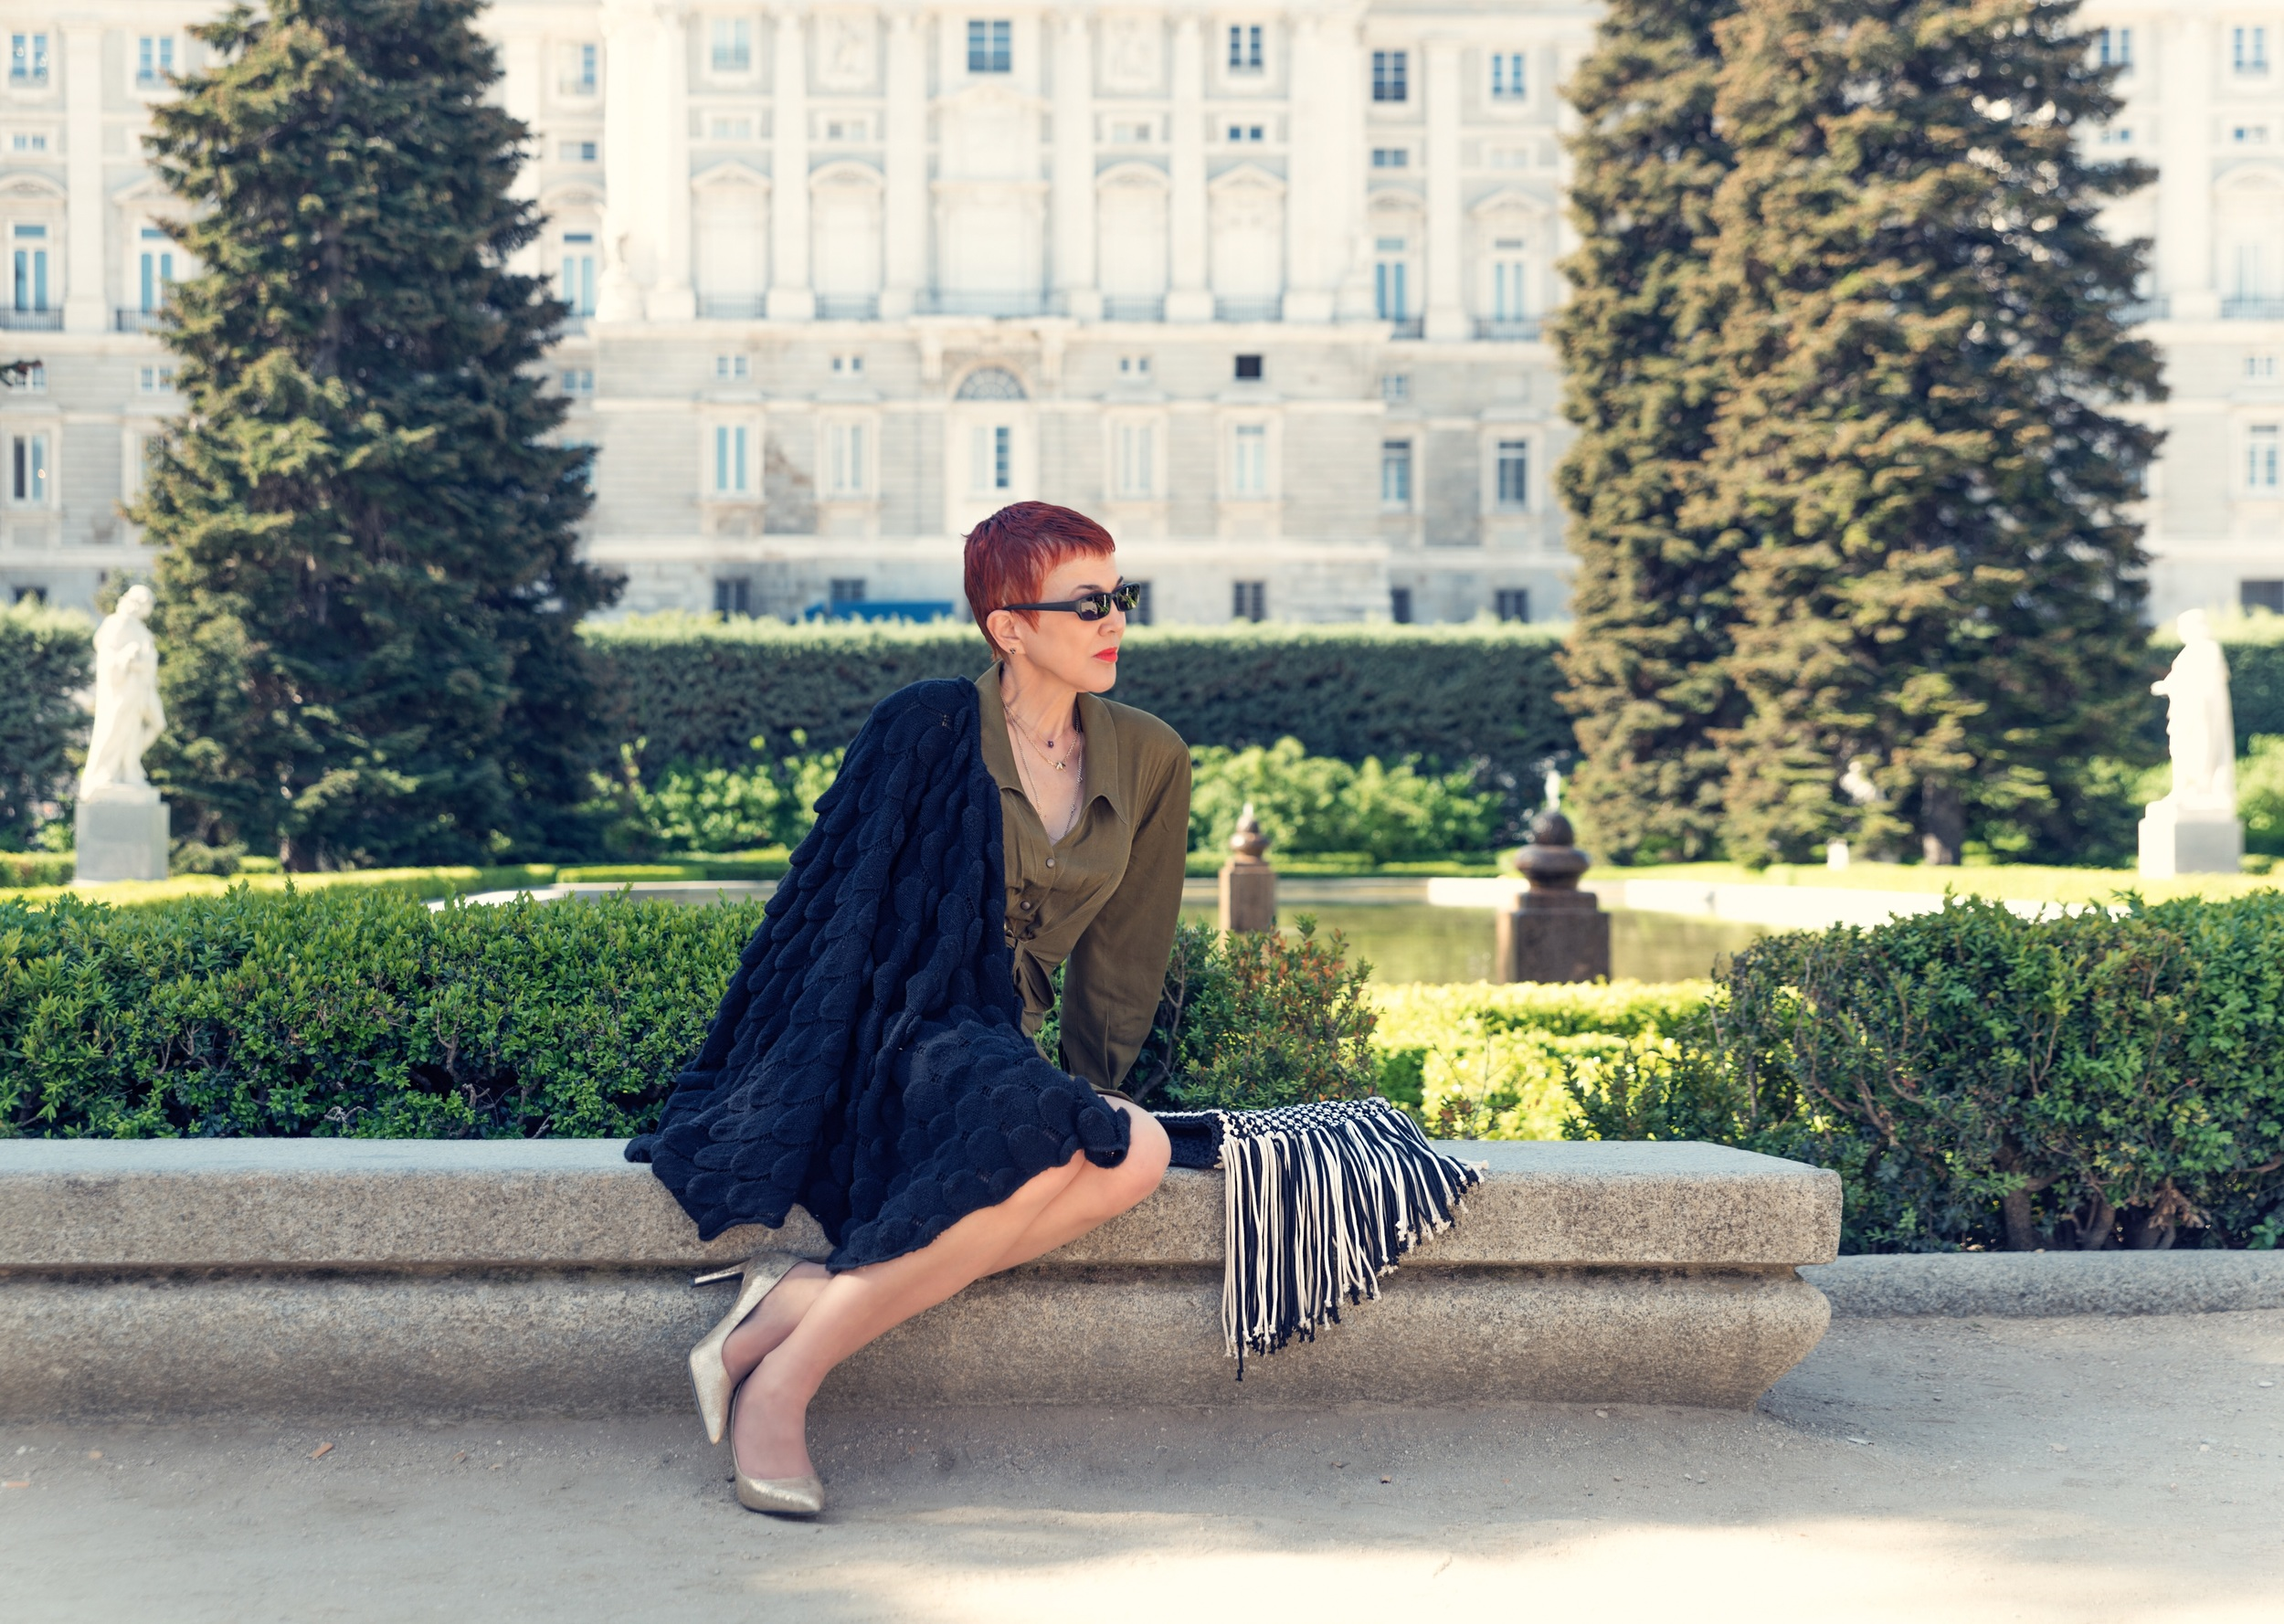 The Splendid Sabatini gardens - Madrid